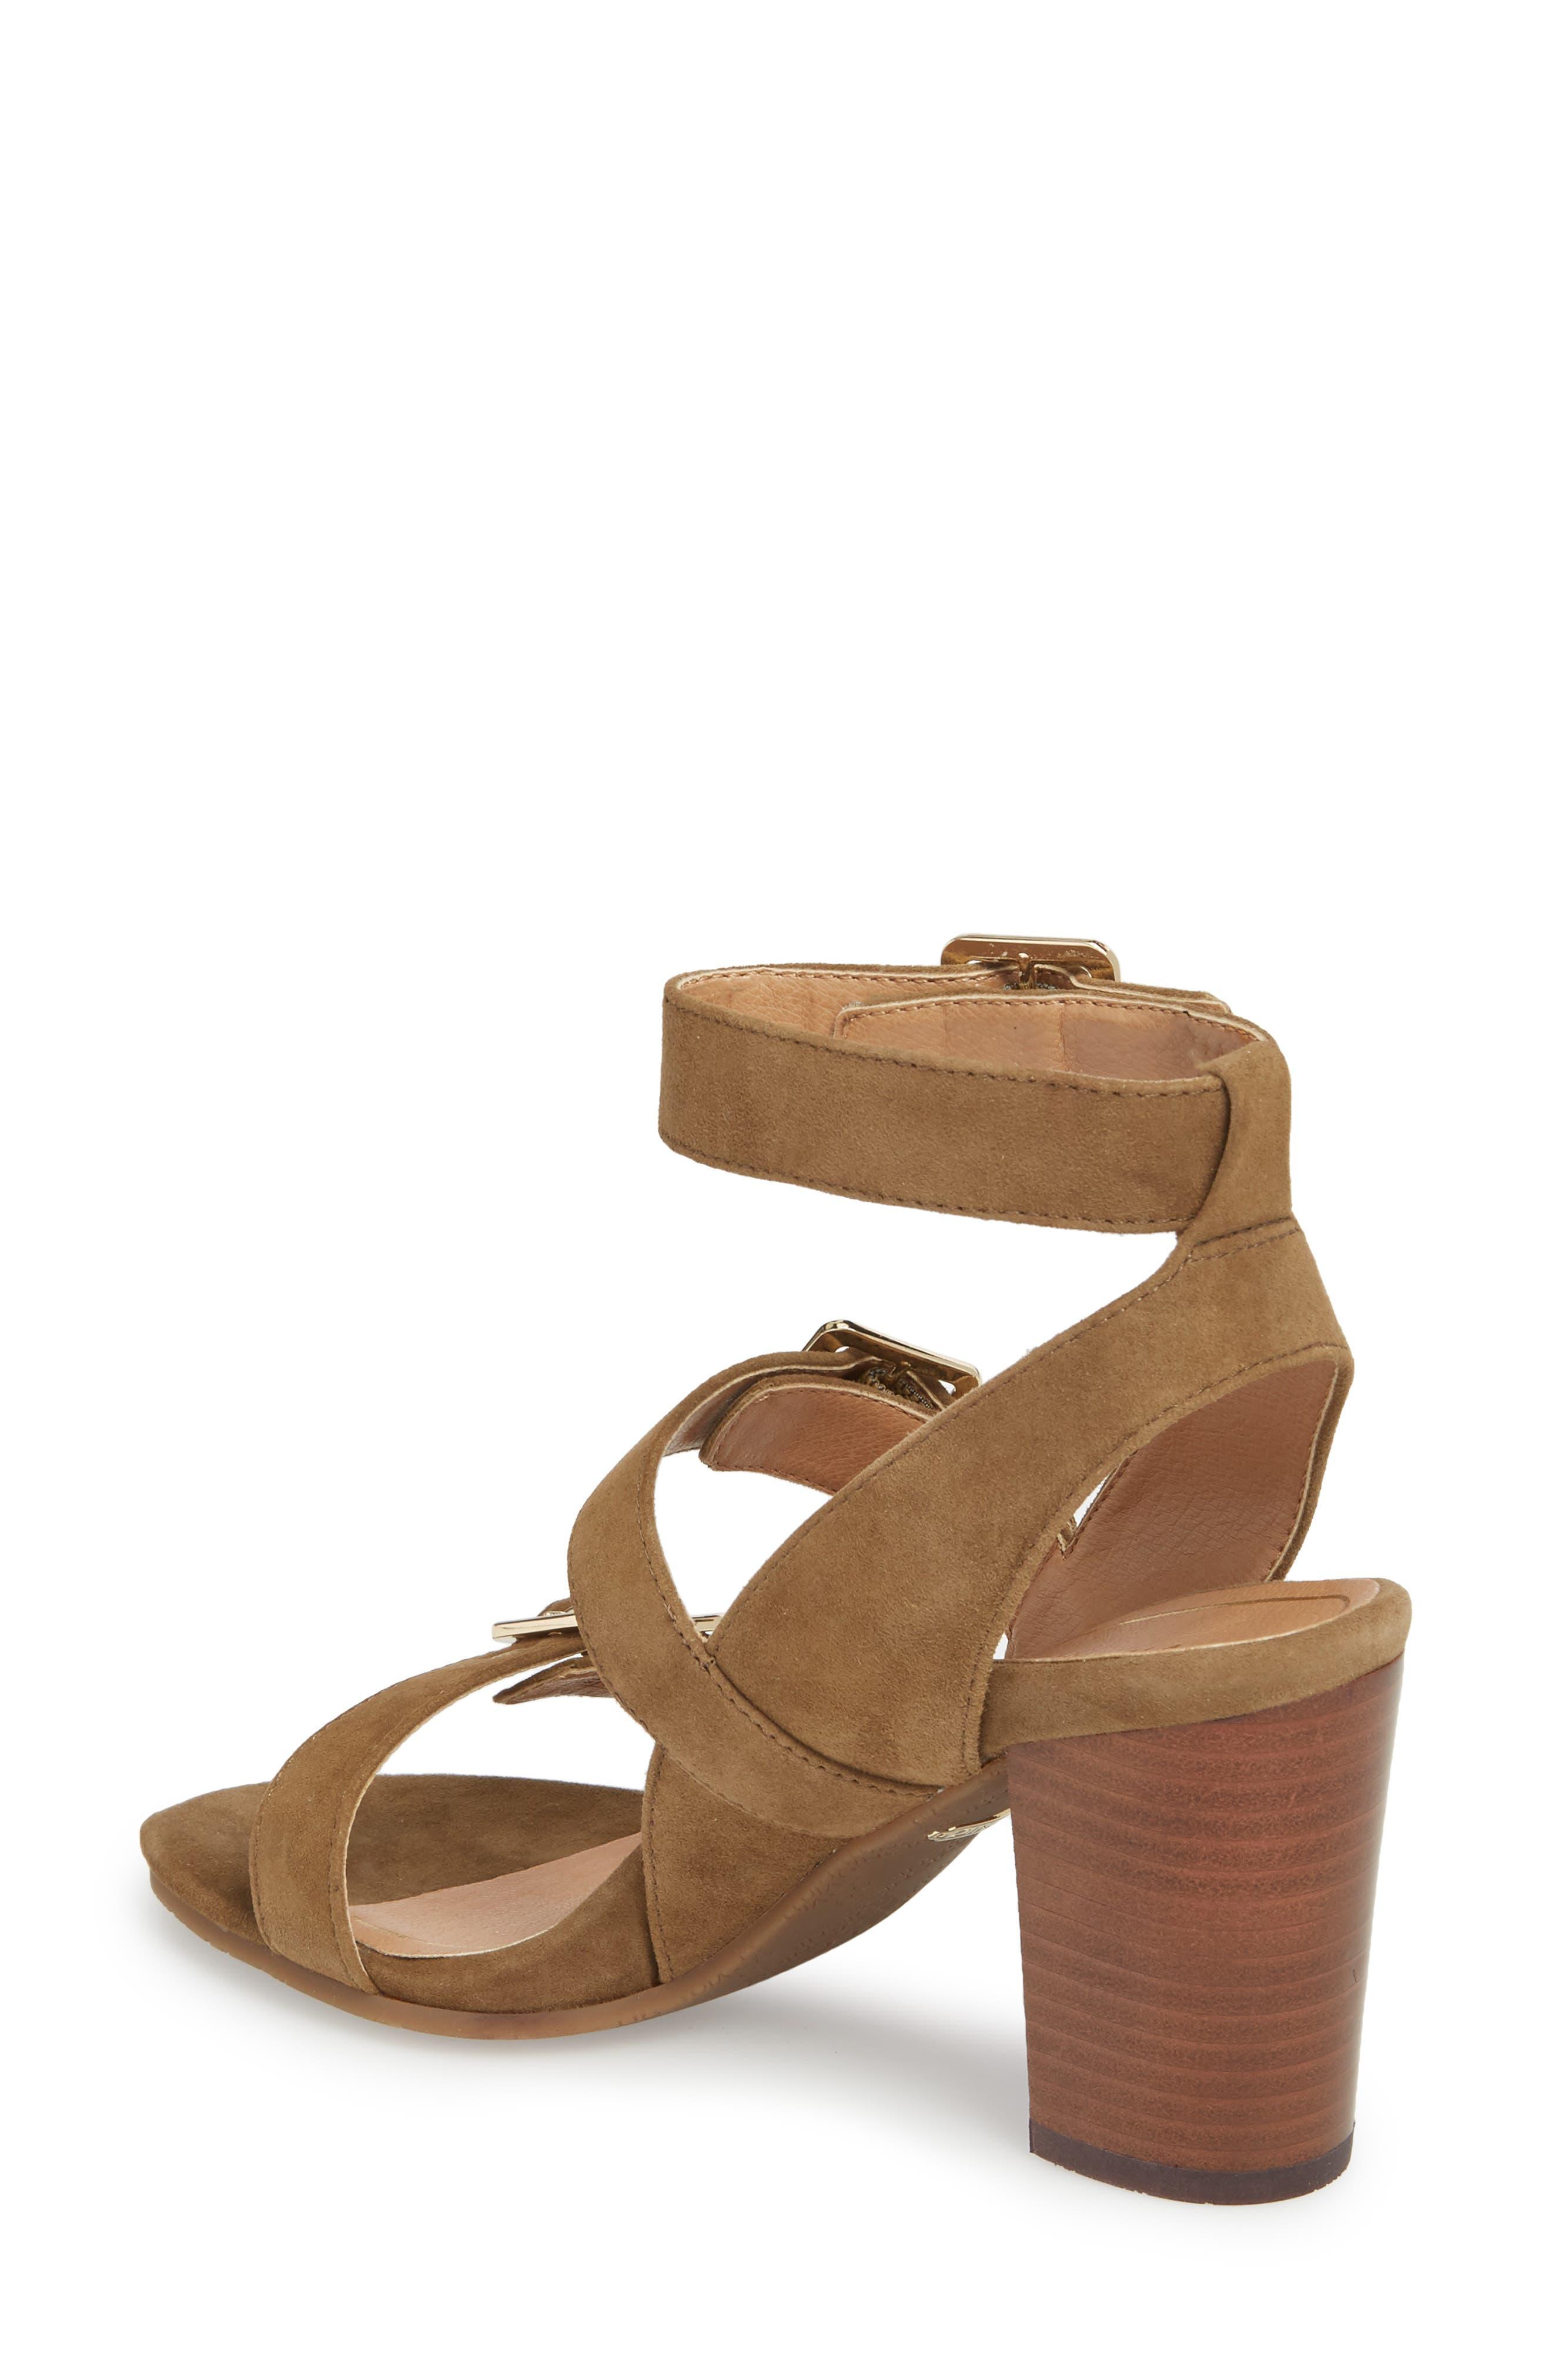 Carmel Block Heel Sandal,                             Alternate thumbnail 2, color,                             310